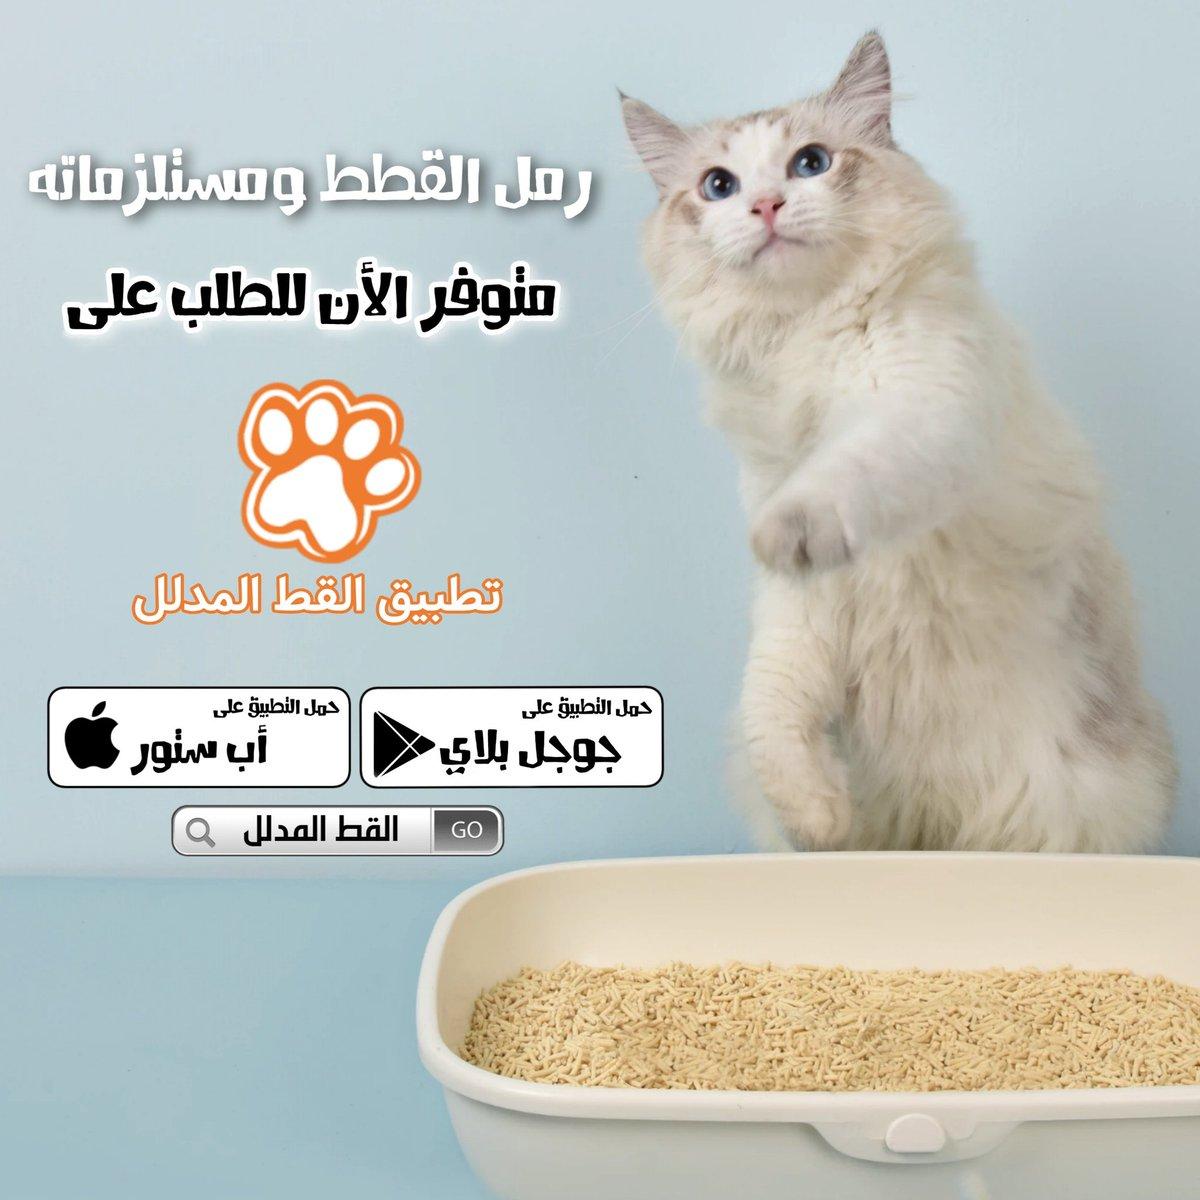 Cute Cat Cutecat43378872 Twitter